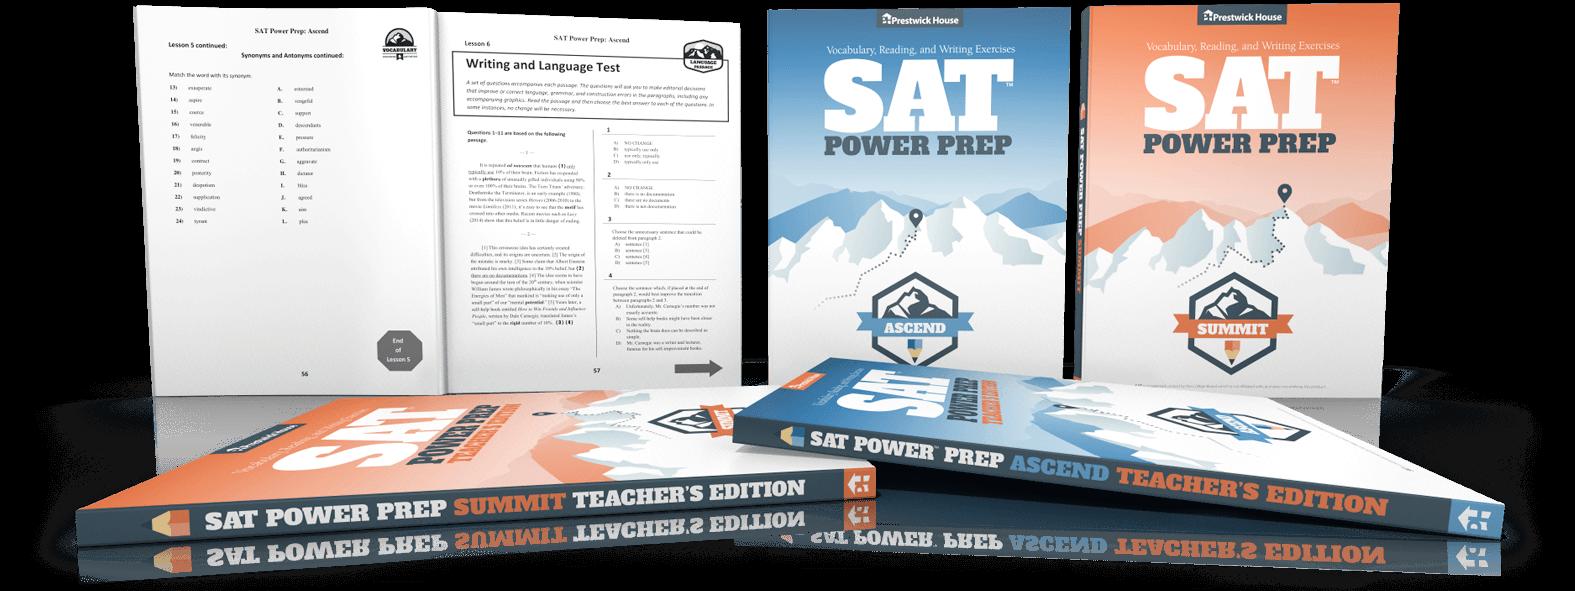 SAT Power Prep & Test Preparation